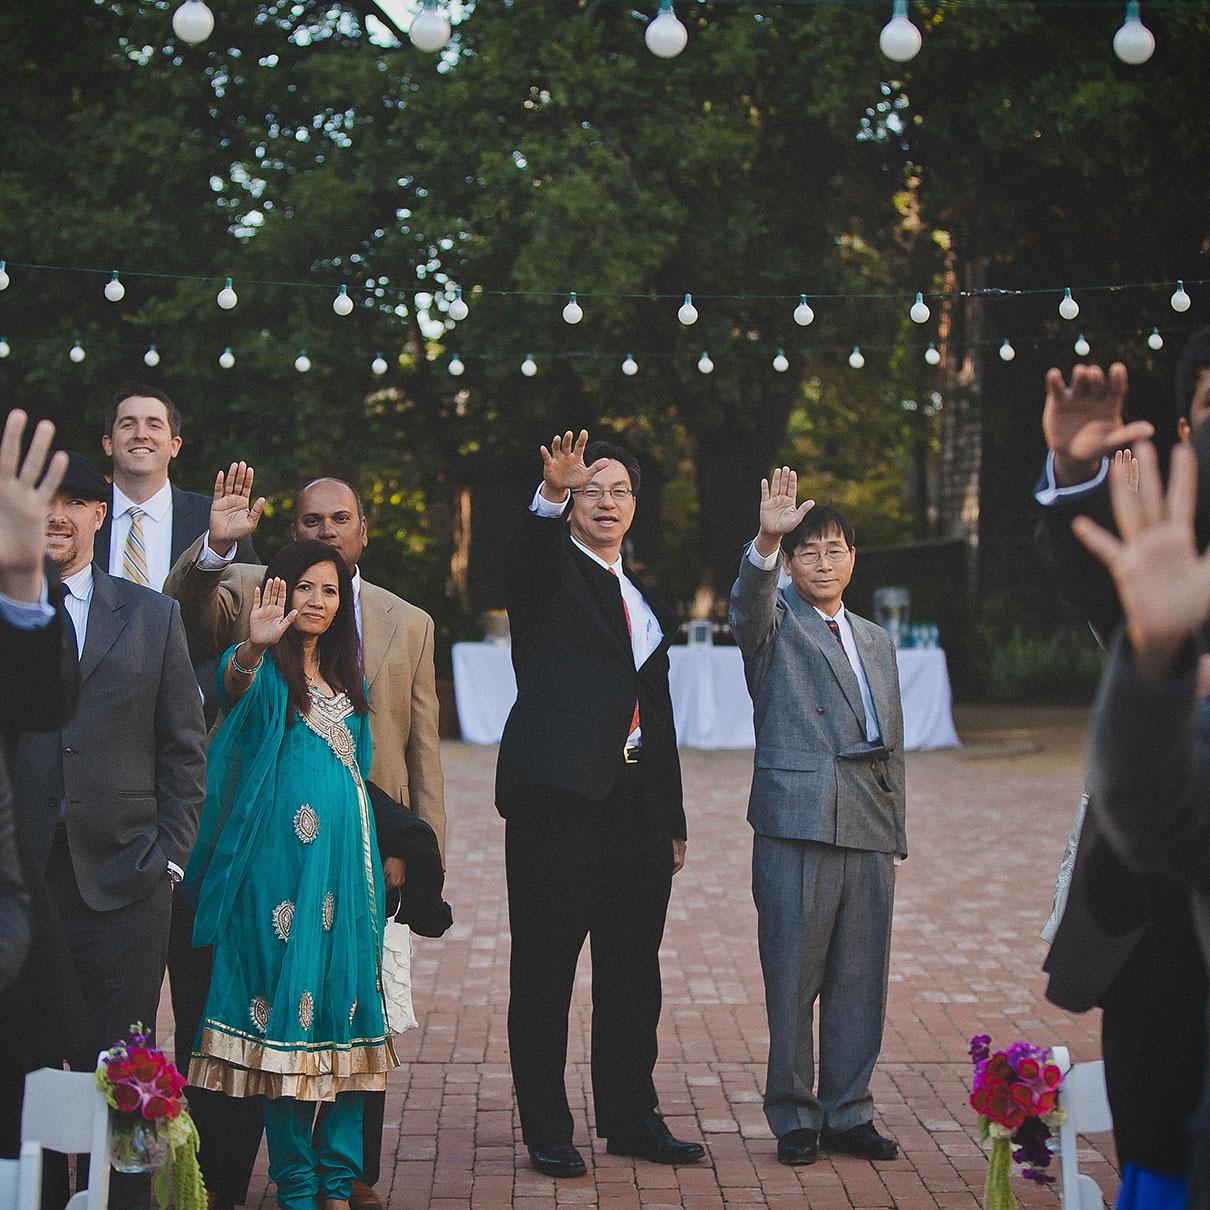 Wedding Wednesdays Q&A: Are Wedding Ceremony Ushers Necessary?